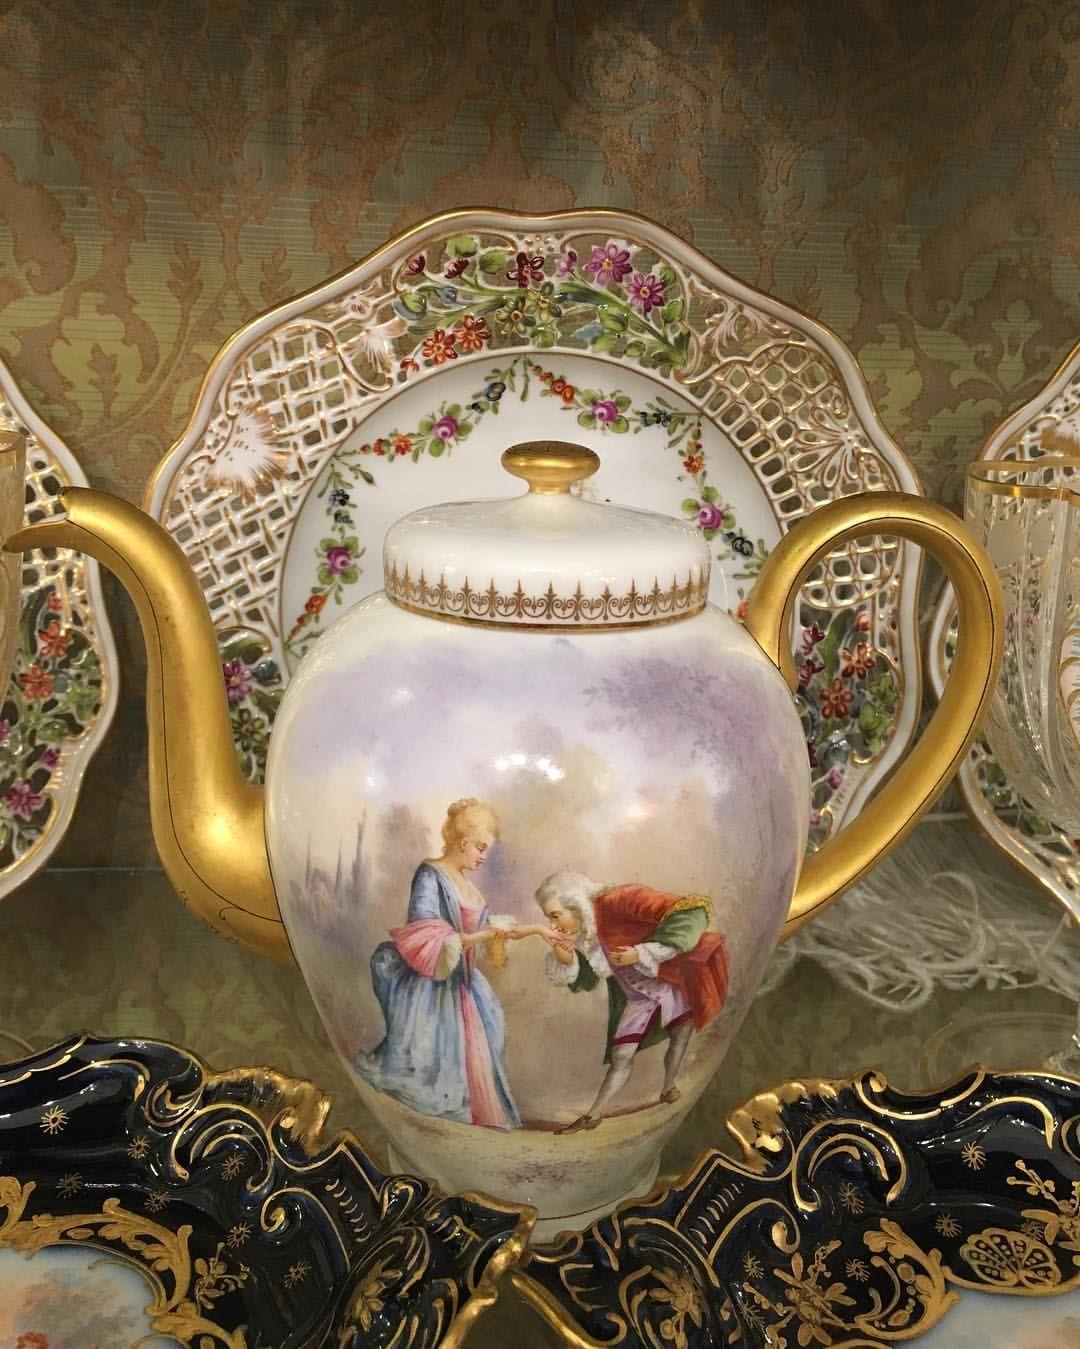 Antique Dresden teapot handpainted @julietrose_antique님의 이 Instagram 사진 보기 • 좋아요 3개